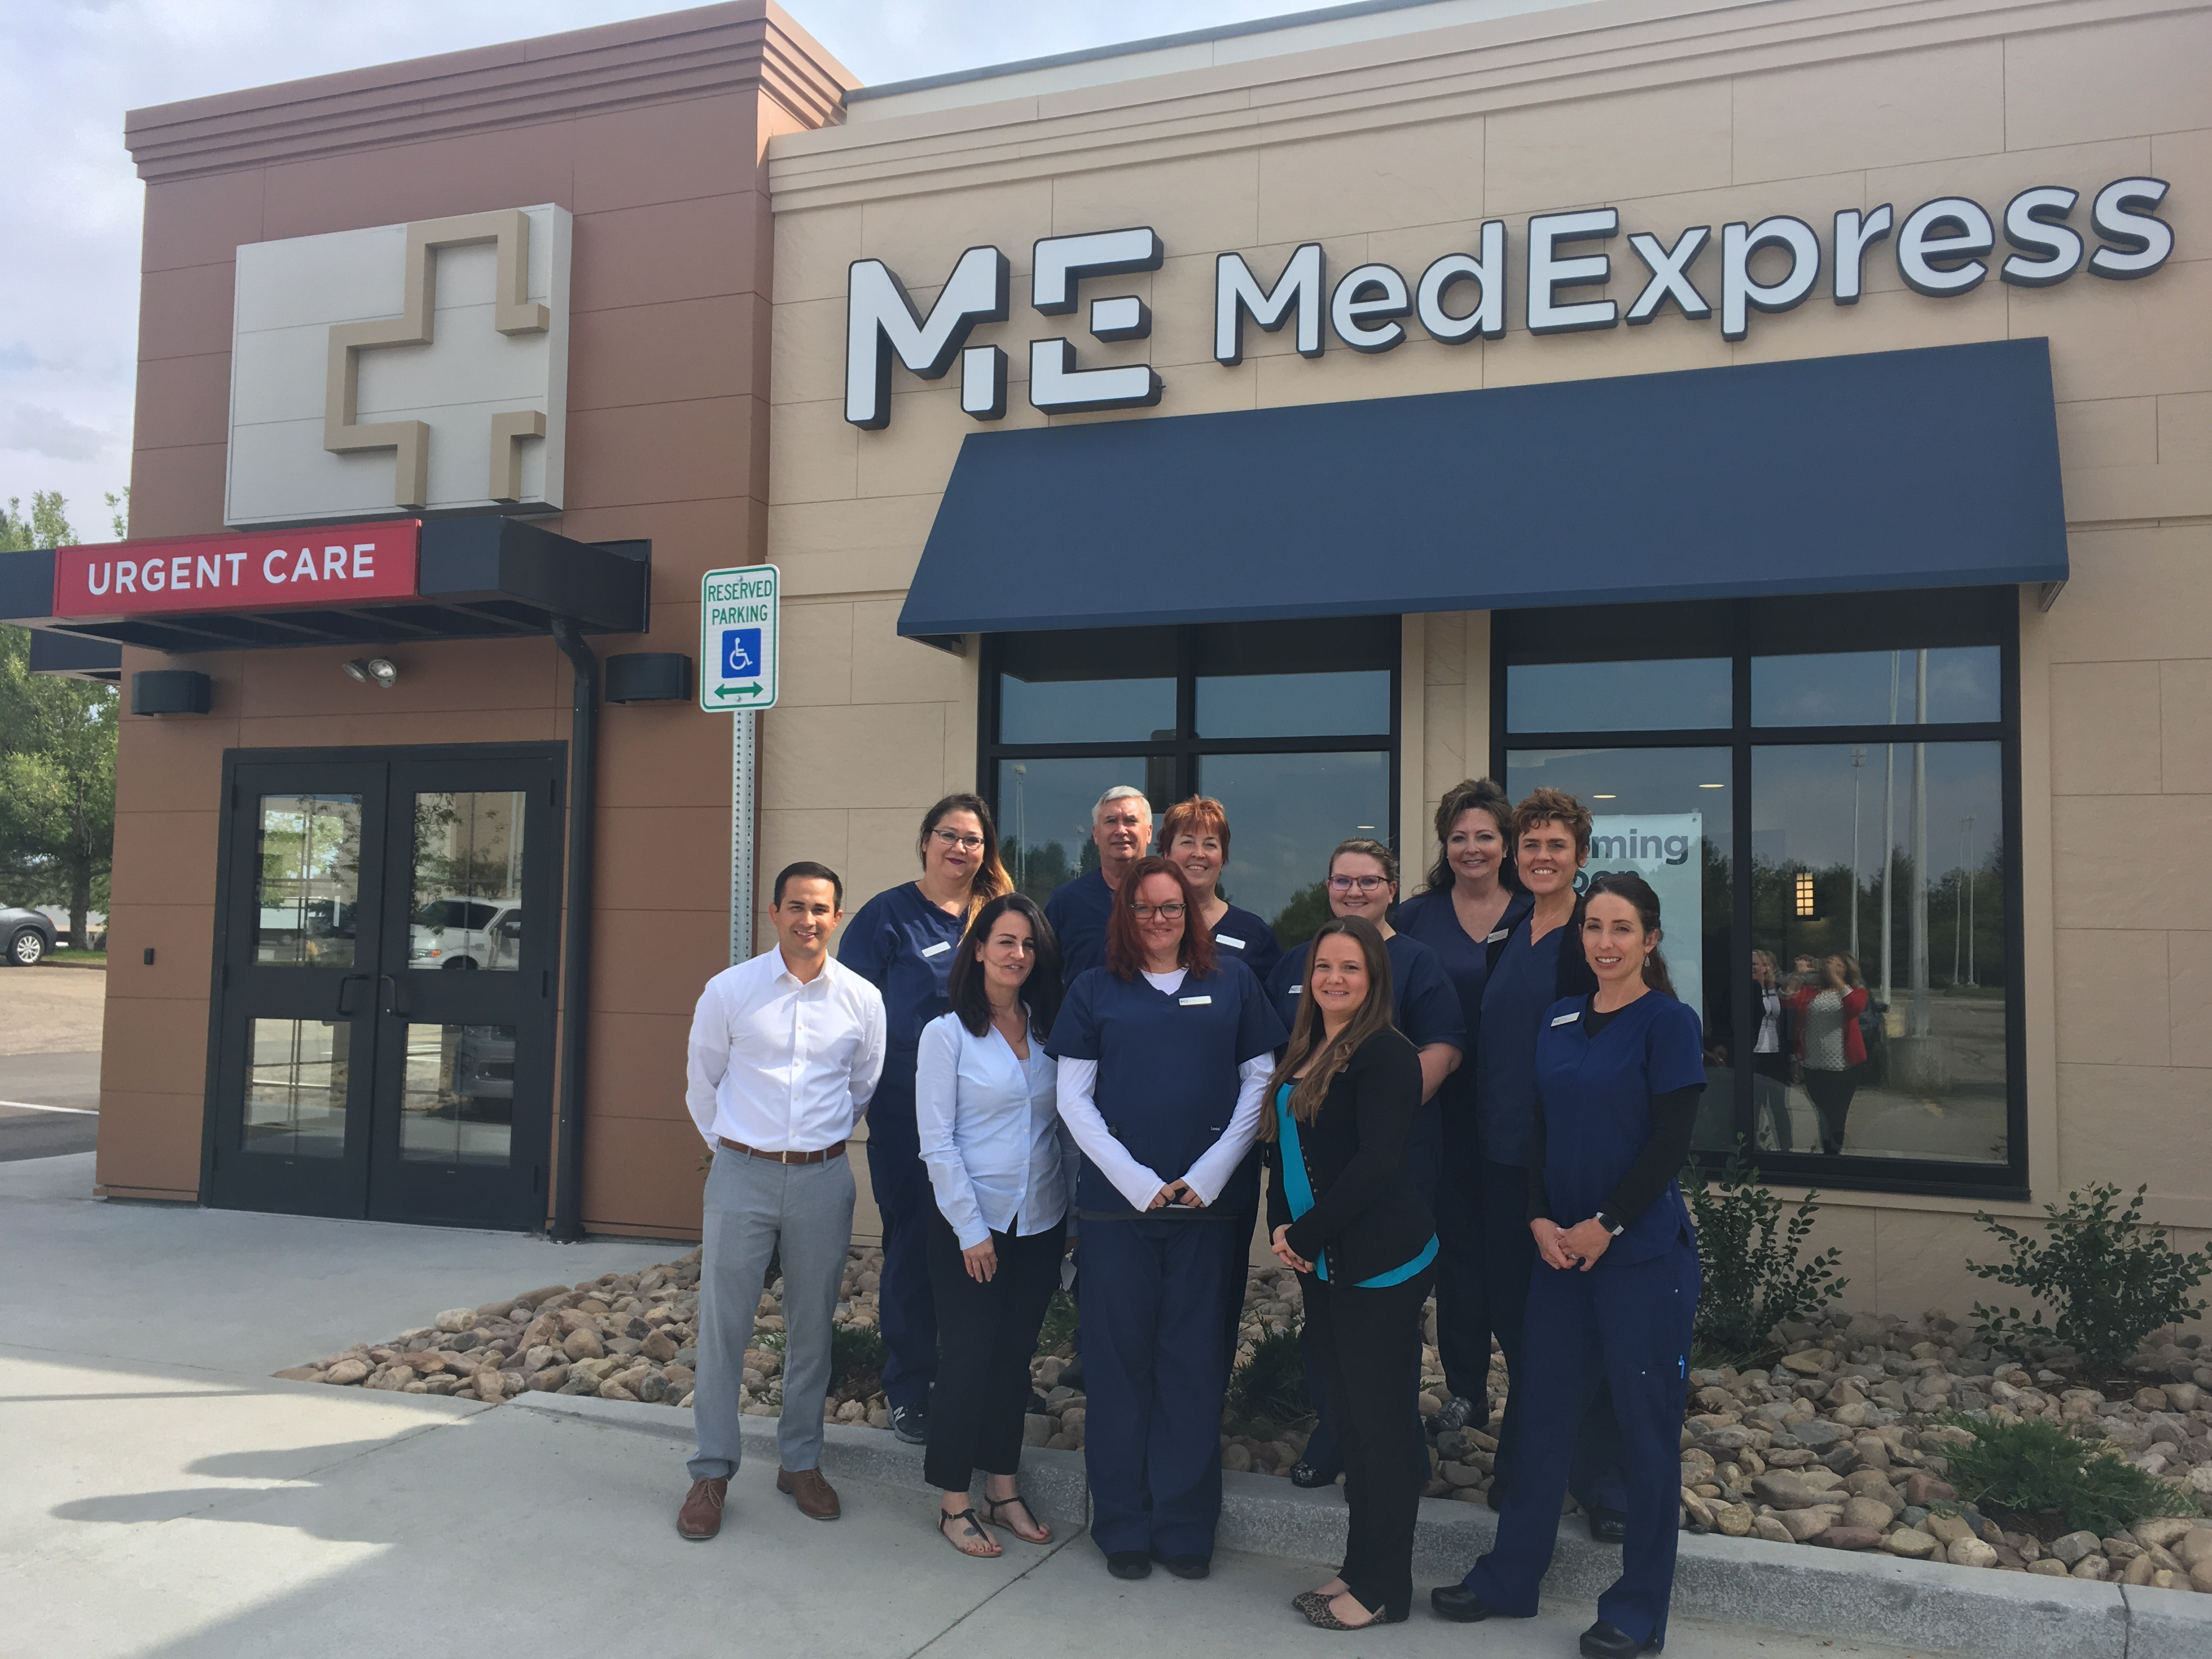 MedExpress Urgent Care image 4